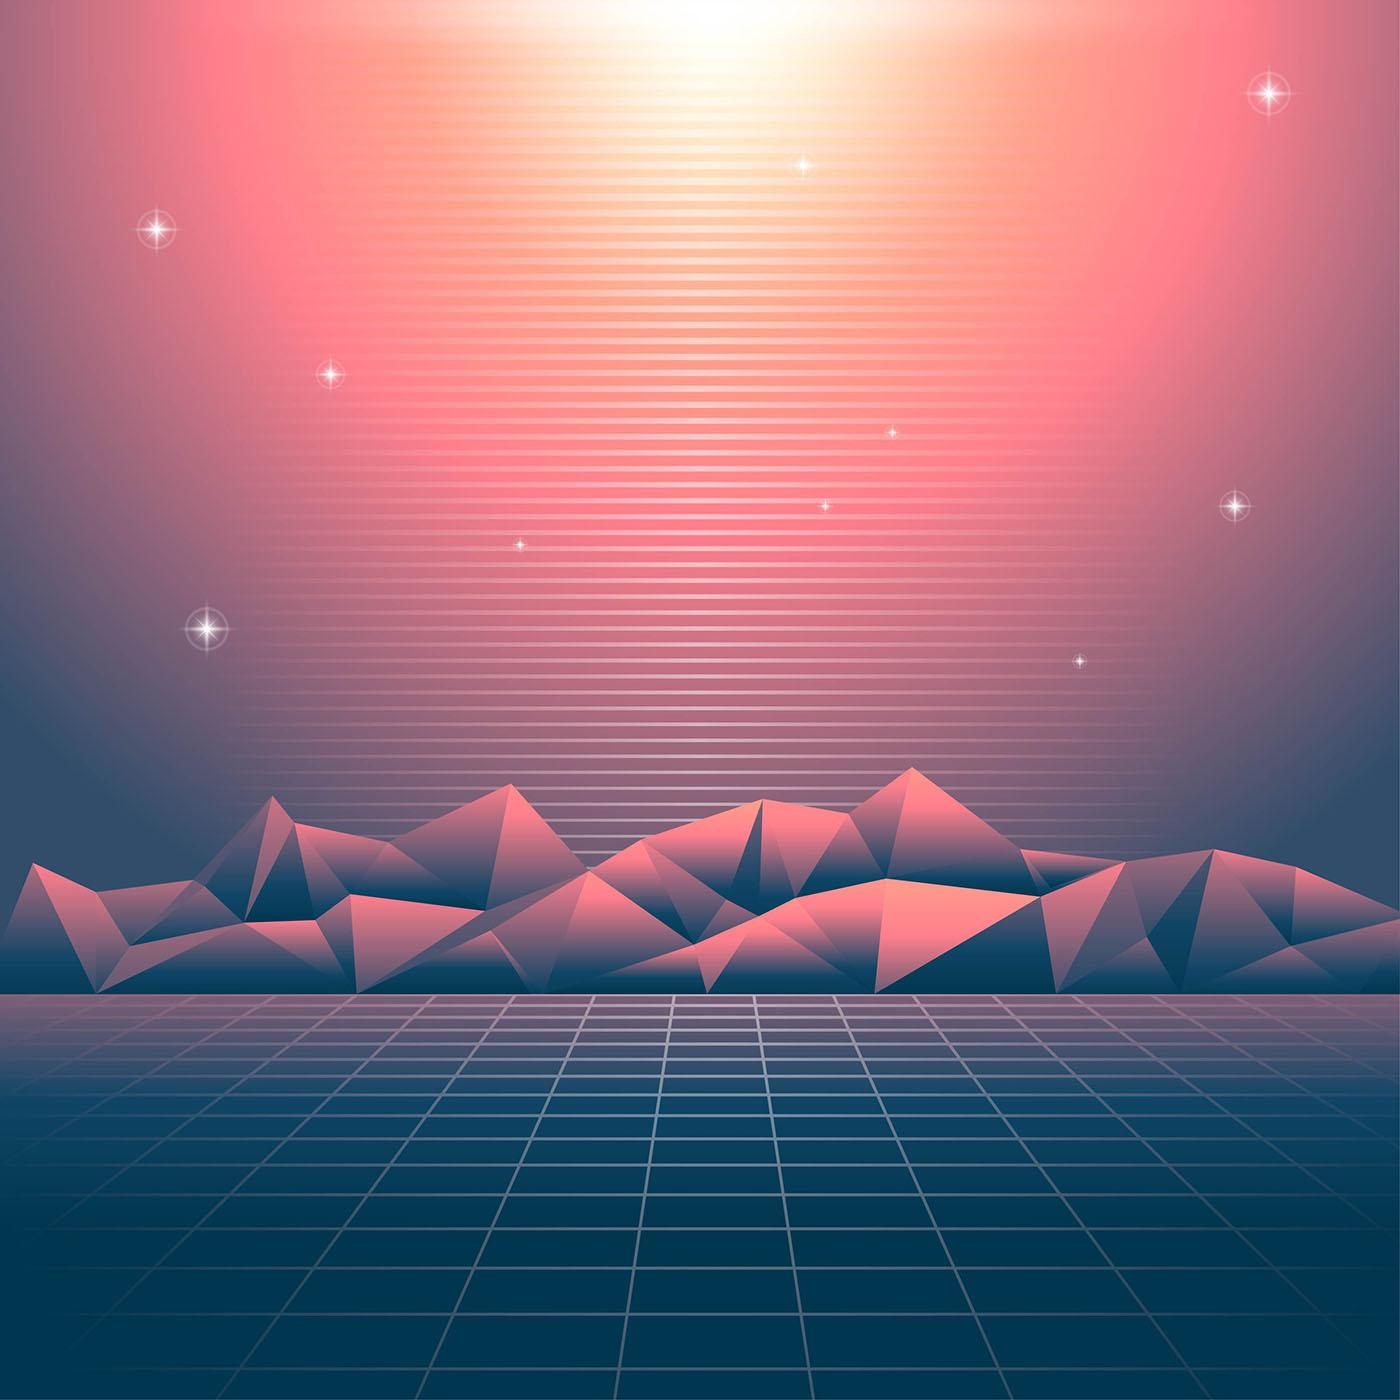 Retro Background Vaporwave Lights Download Free Vectors Clipart